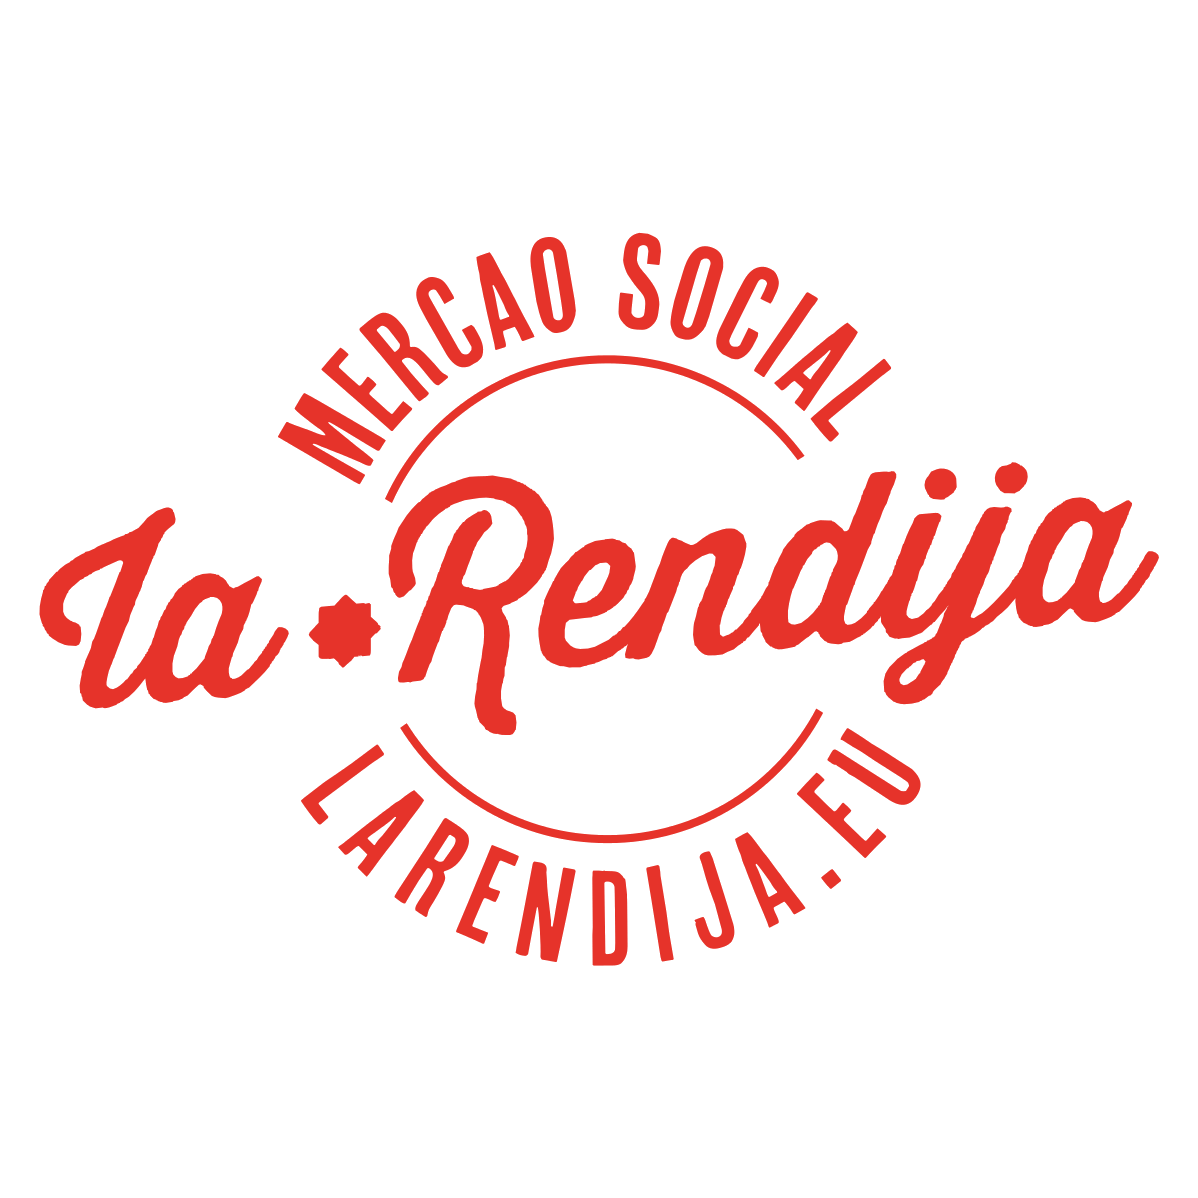 logo-rendija-trans